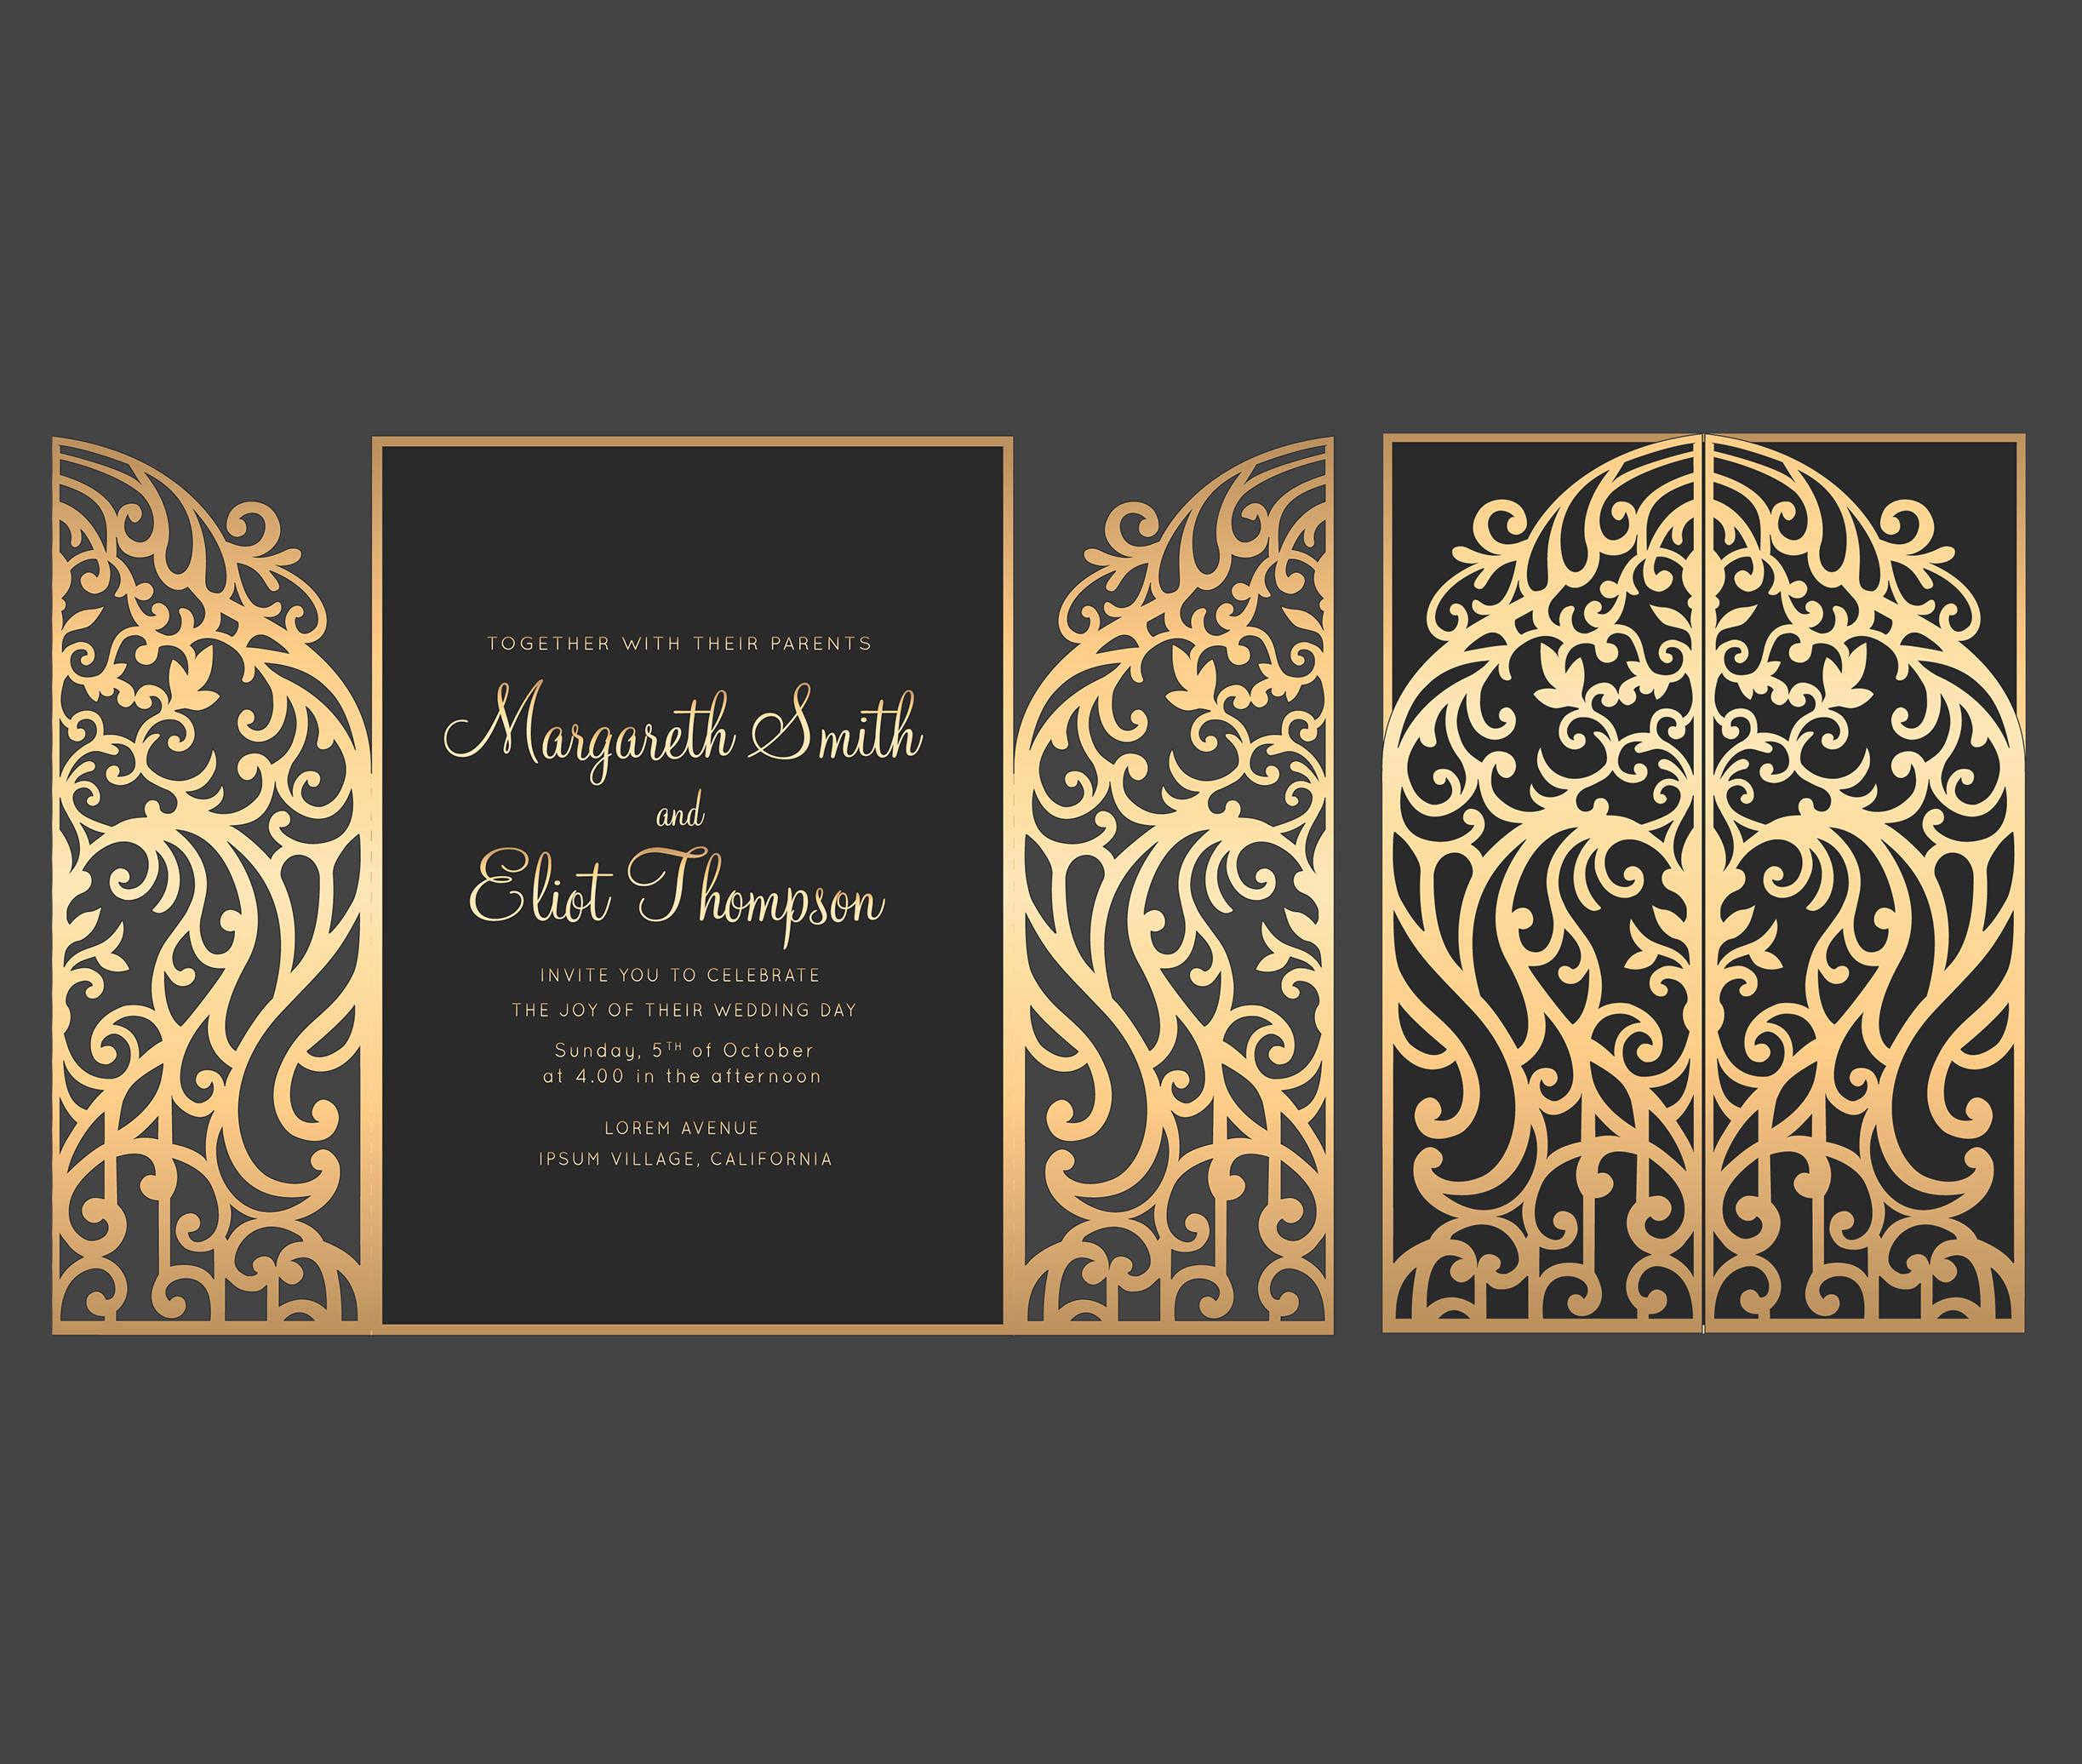 Gate Fold Invitation Template Awesome 5x7 Gate Fold Door Wedding Invitation Card Template